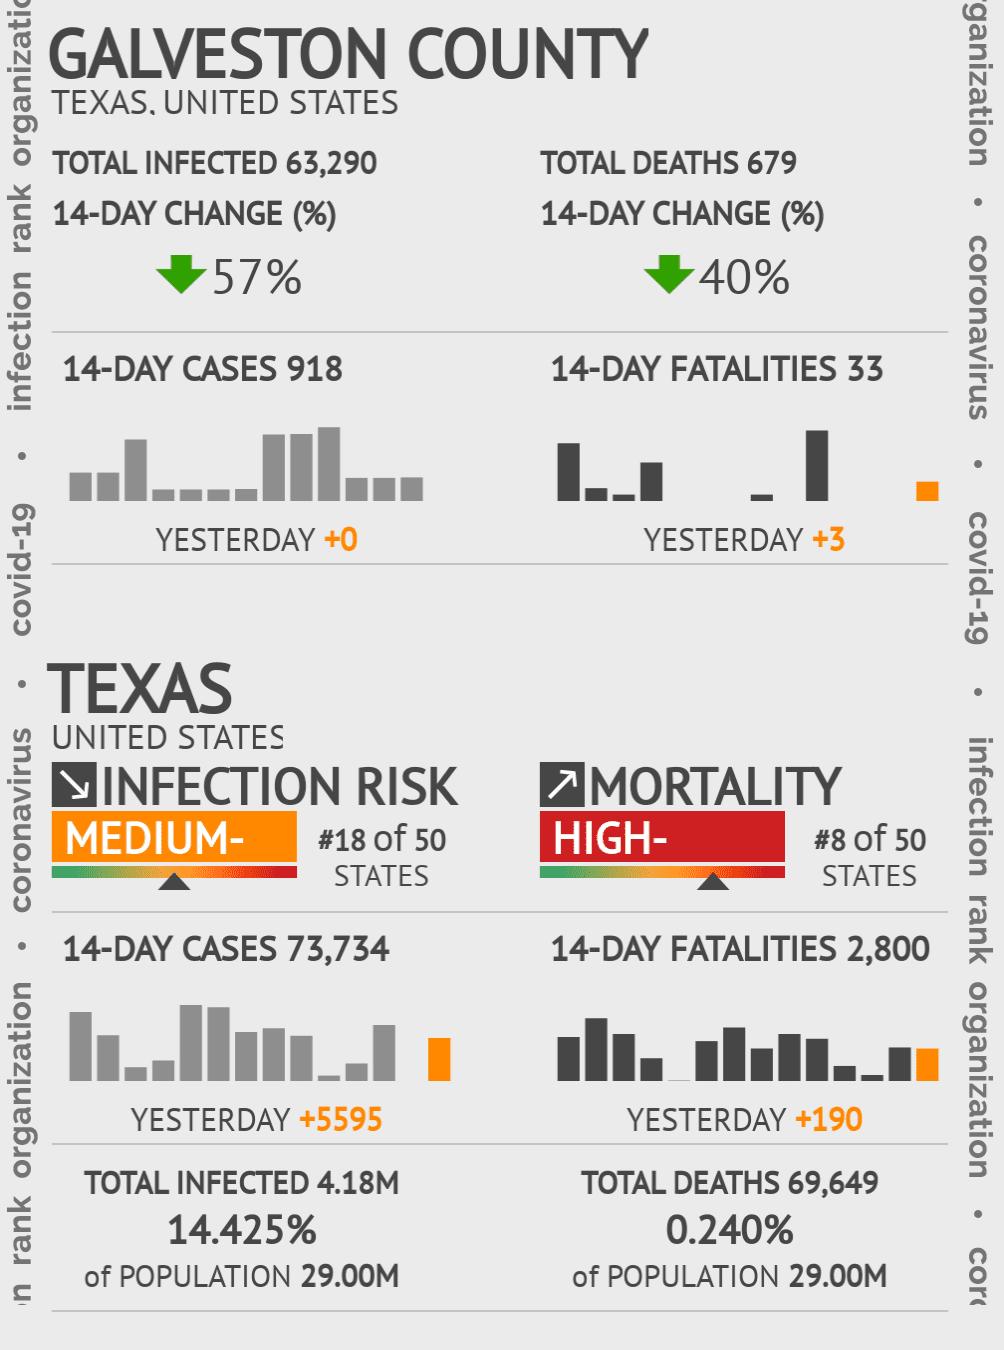 Galveston County Coronavirus Covid-19 Risk of Infection on January 21, 2021